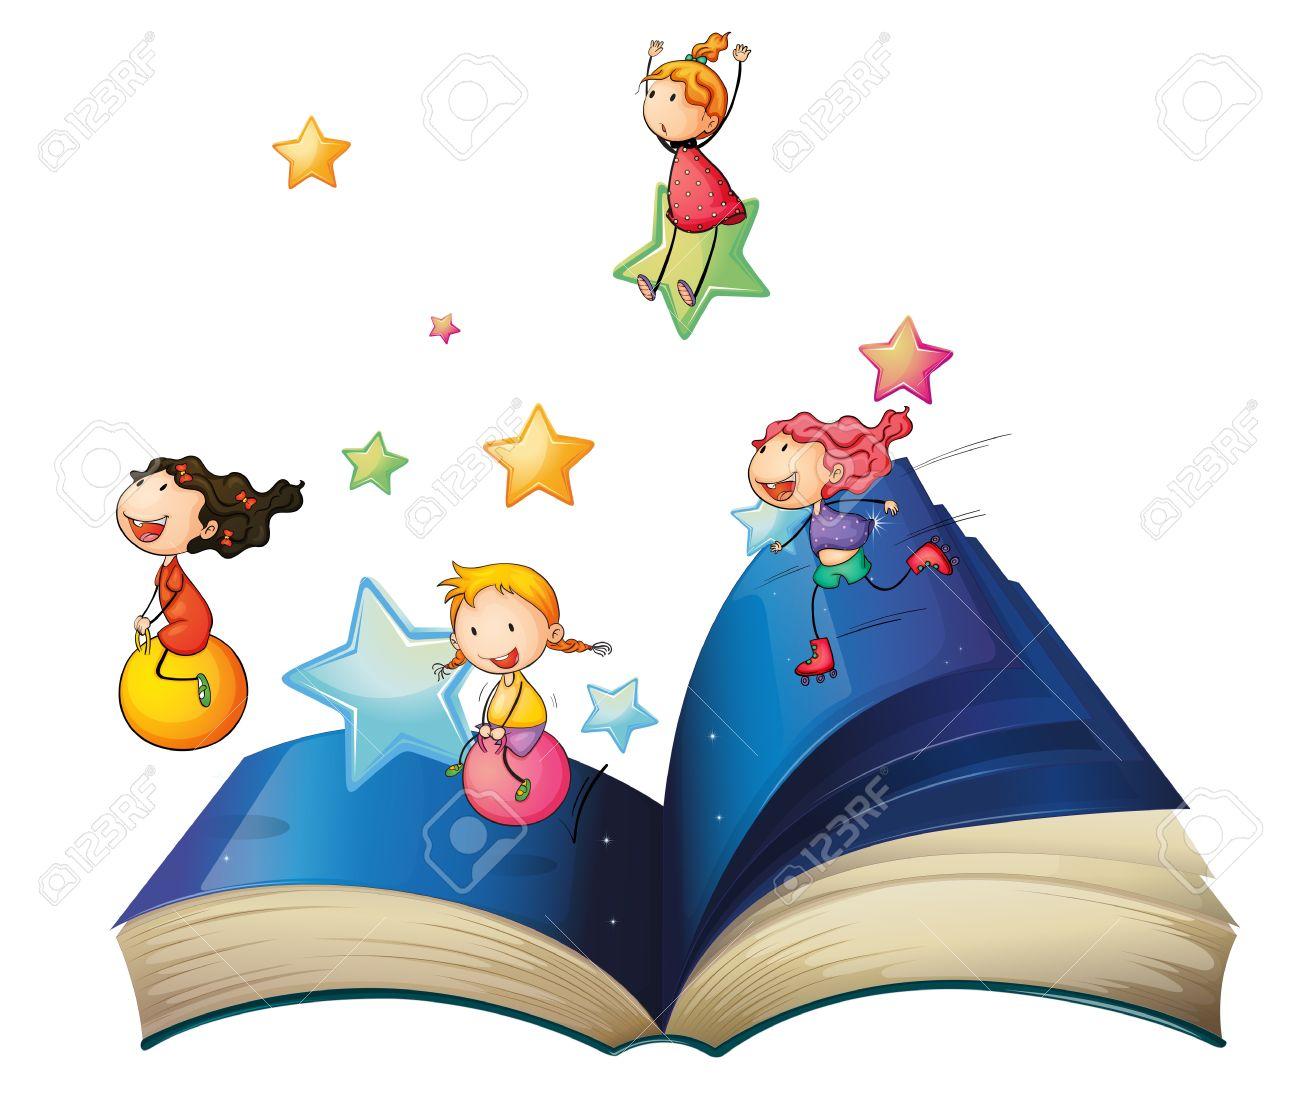 Bienvenidos al nuevo foro de apoyo a Noe #238 / 24.03.15 ~ 27.03.15 20272881-Illustration-of-a-book-with-children-playing-on-a-white-background-Stock-Vector